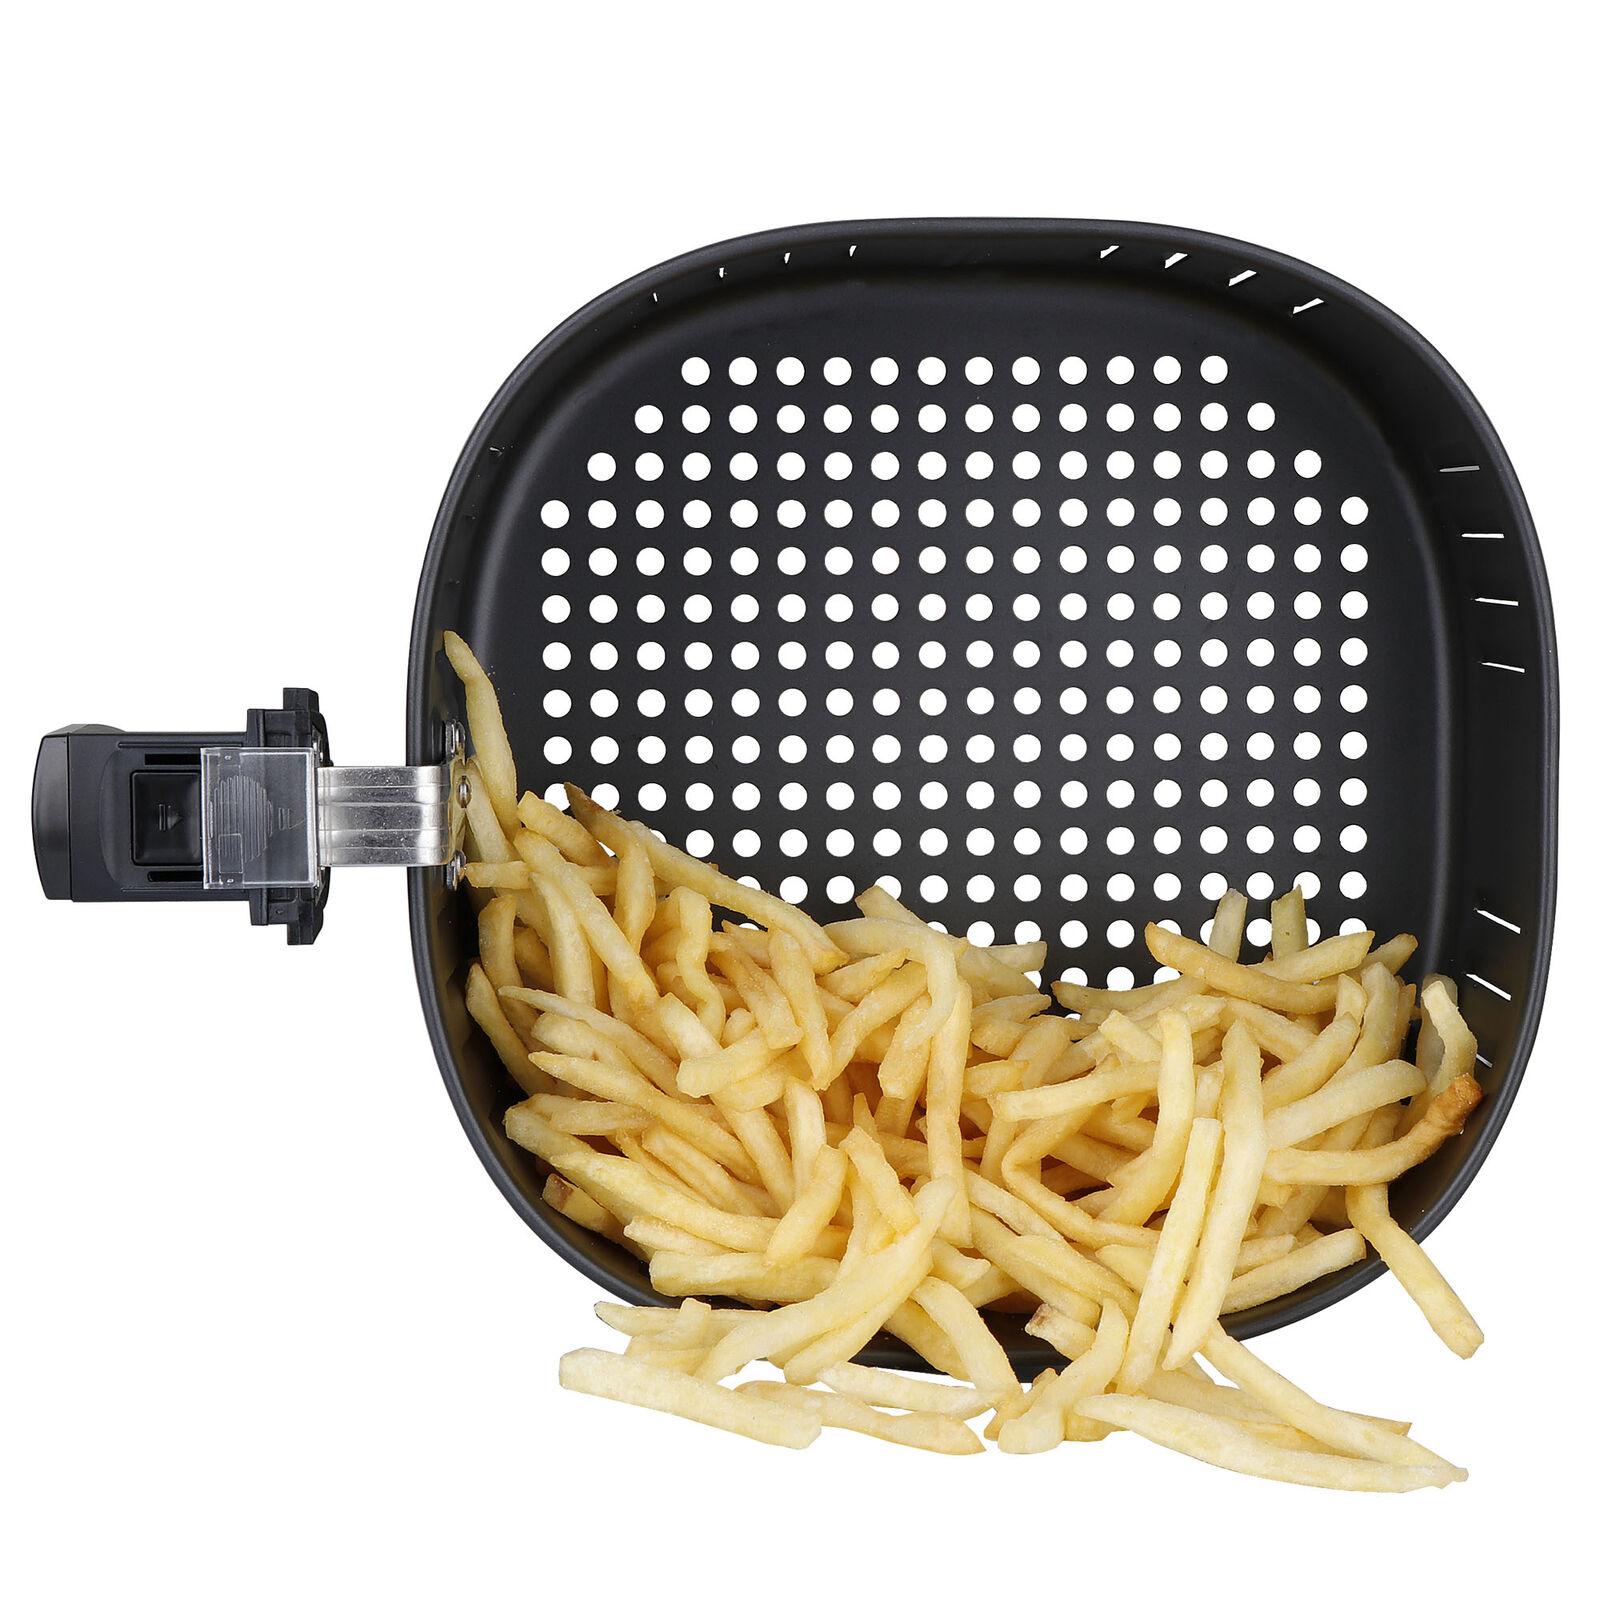 7.6QT Large Air Fryer w/Capacity Expansion Rack 1700W Digital Screen Fryers